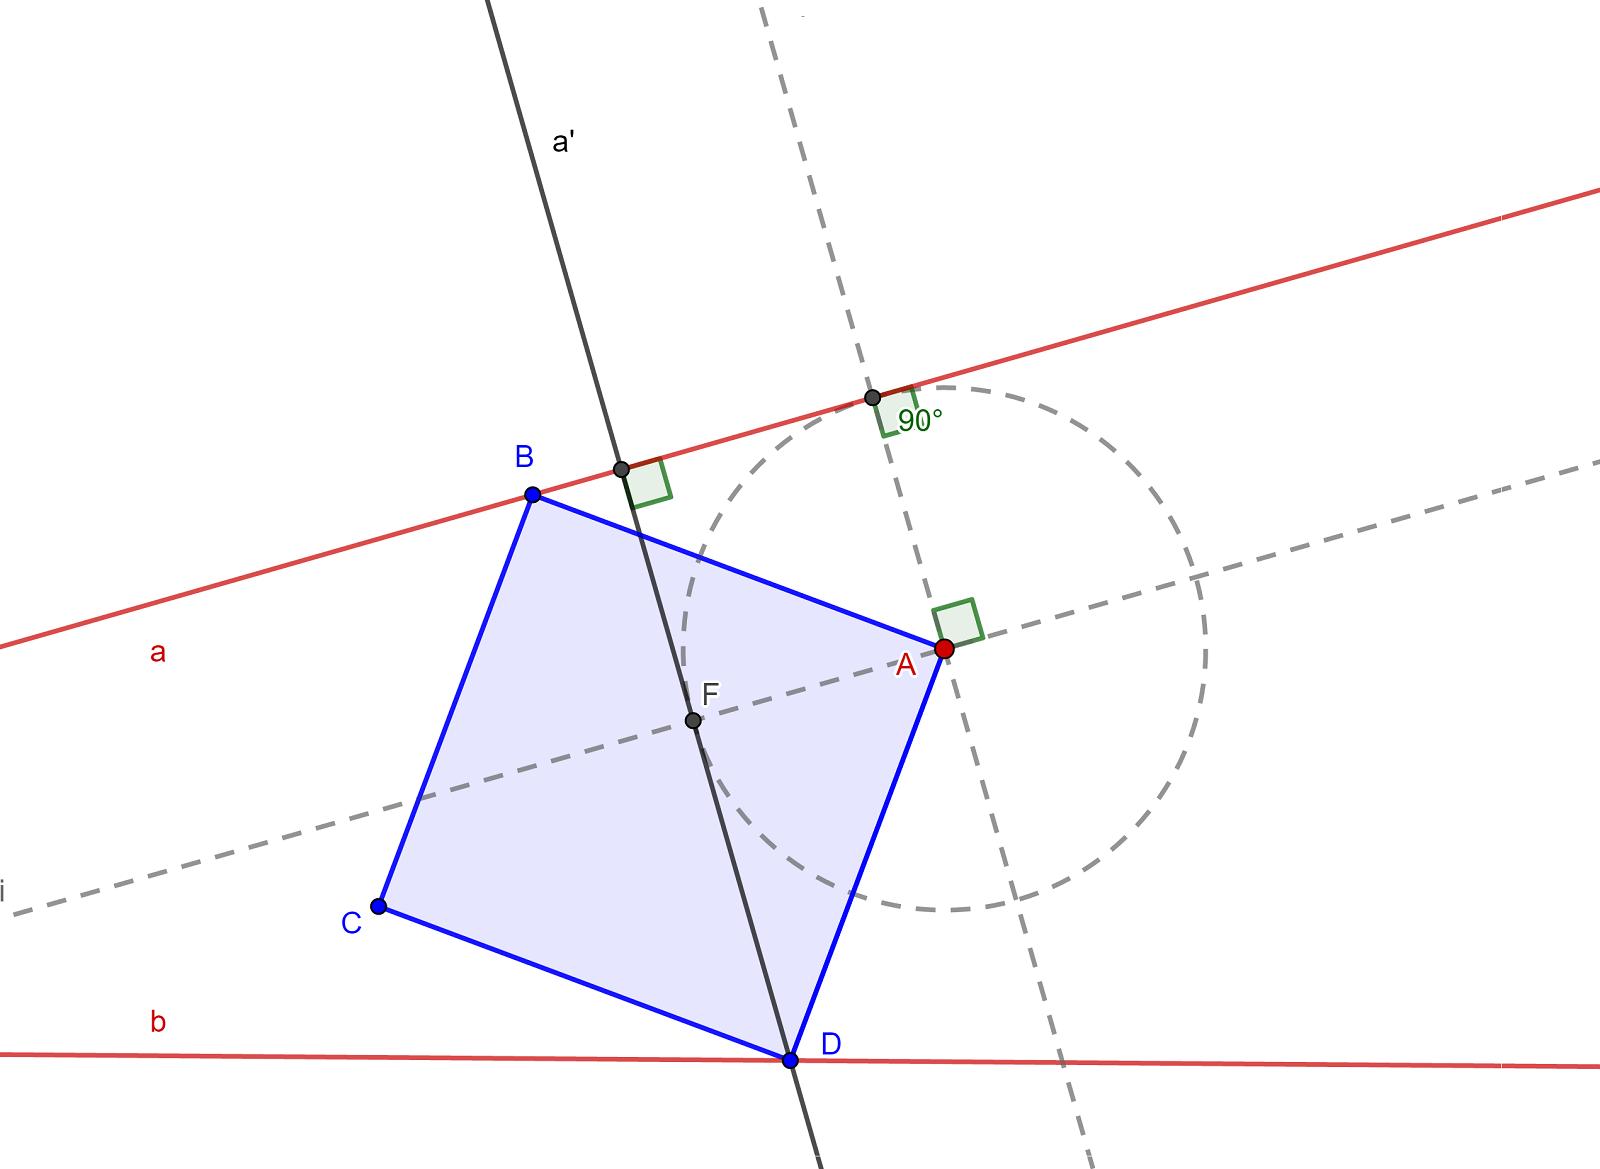 http://forum.matematika.cz/upload3/img/2019-03/31576_hhh.png